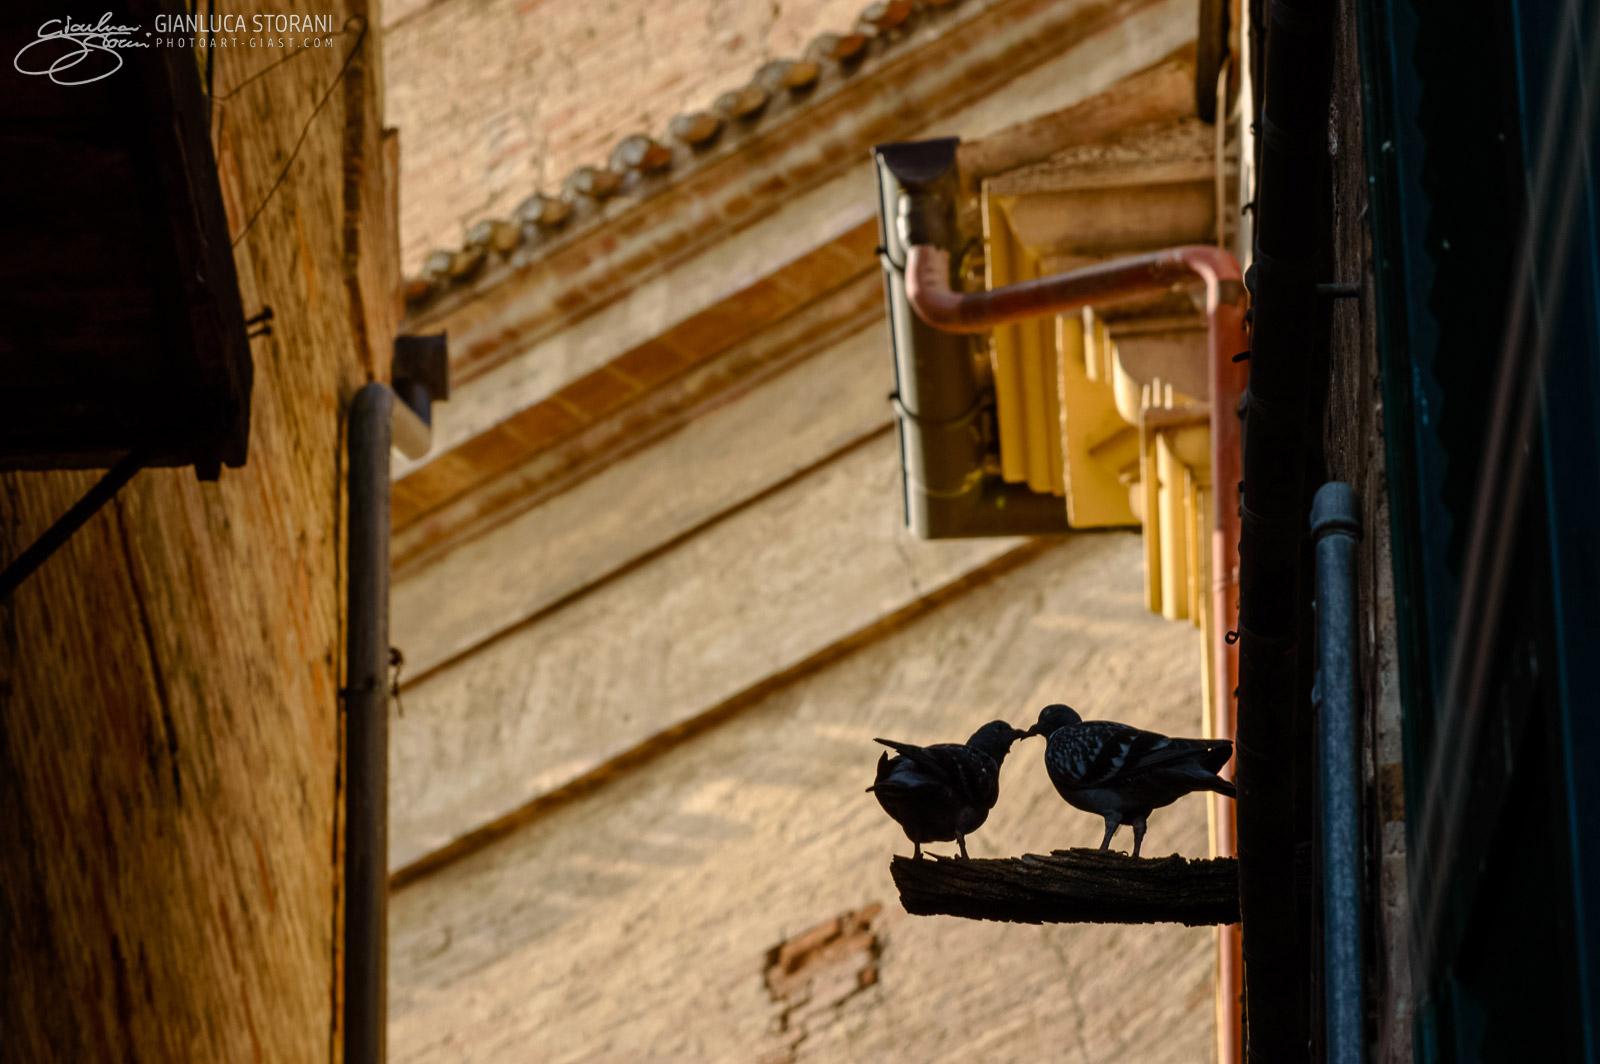 Due piccioncini affettuosi - Gianluca Storani Photo Art (ID: 4-2373)